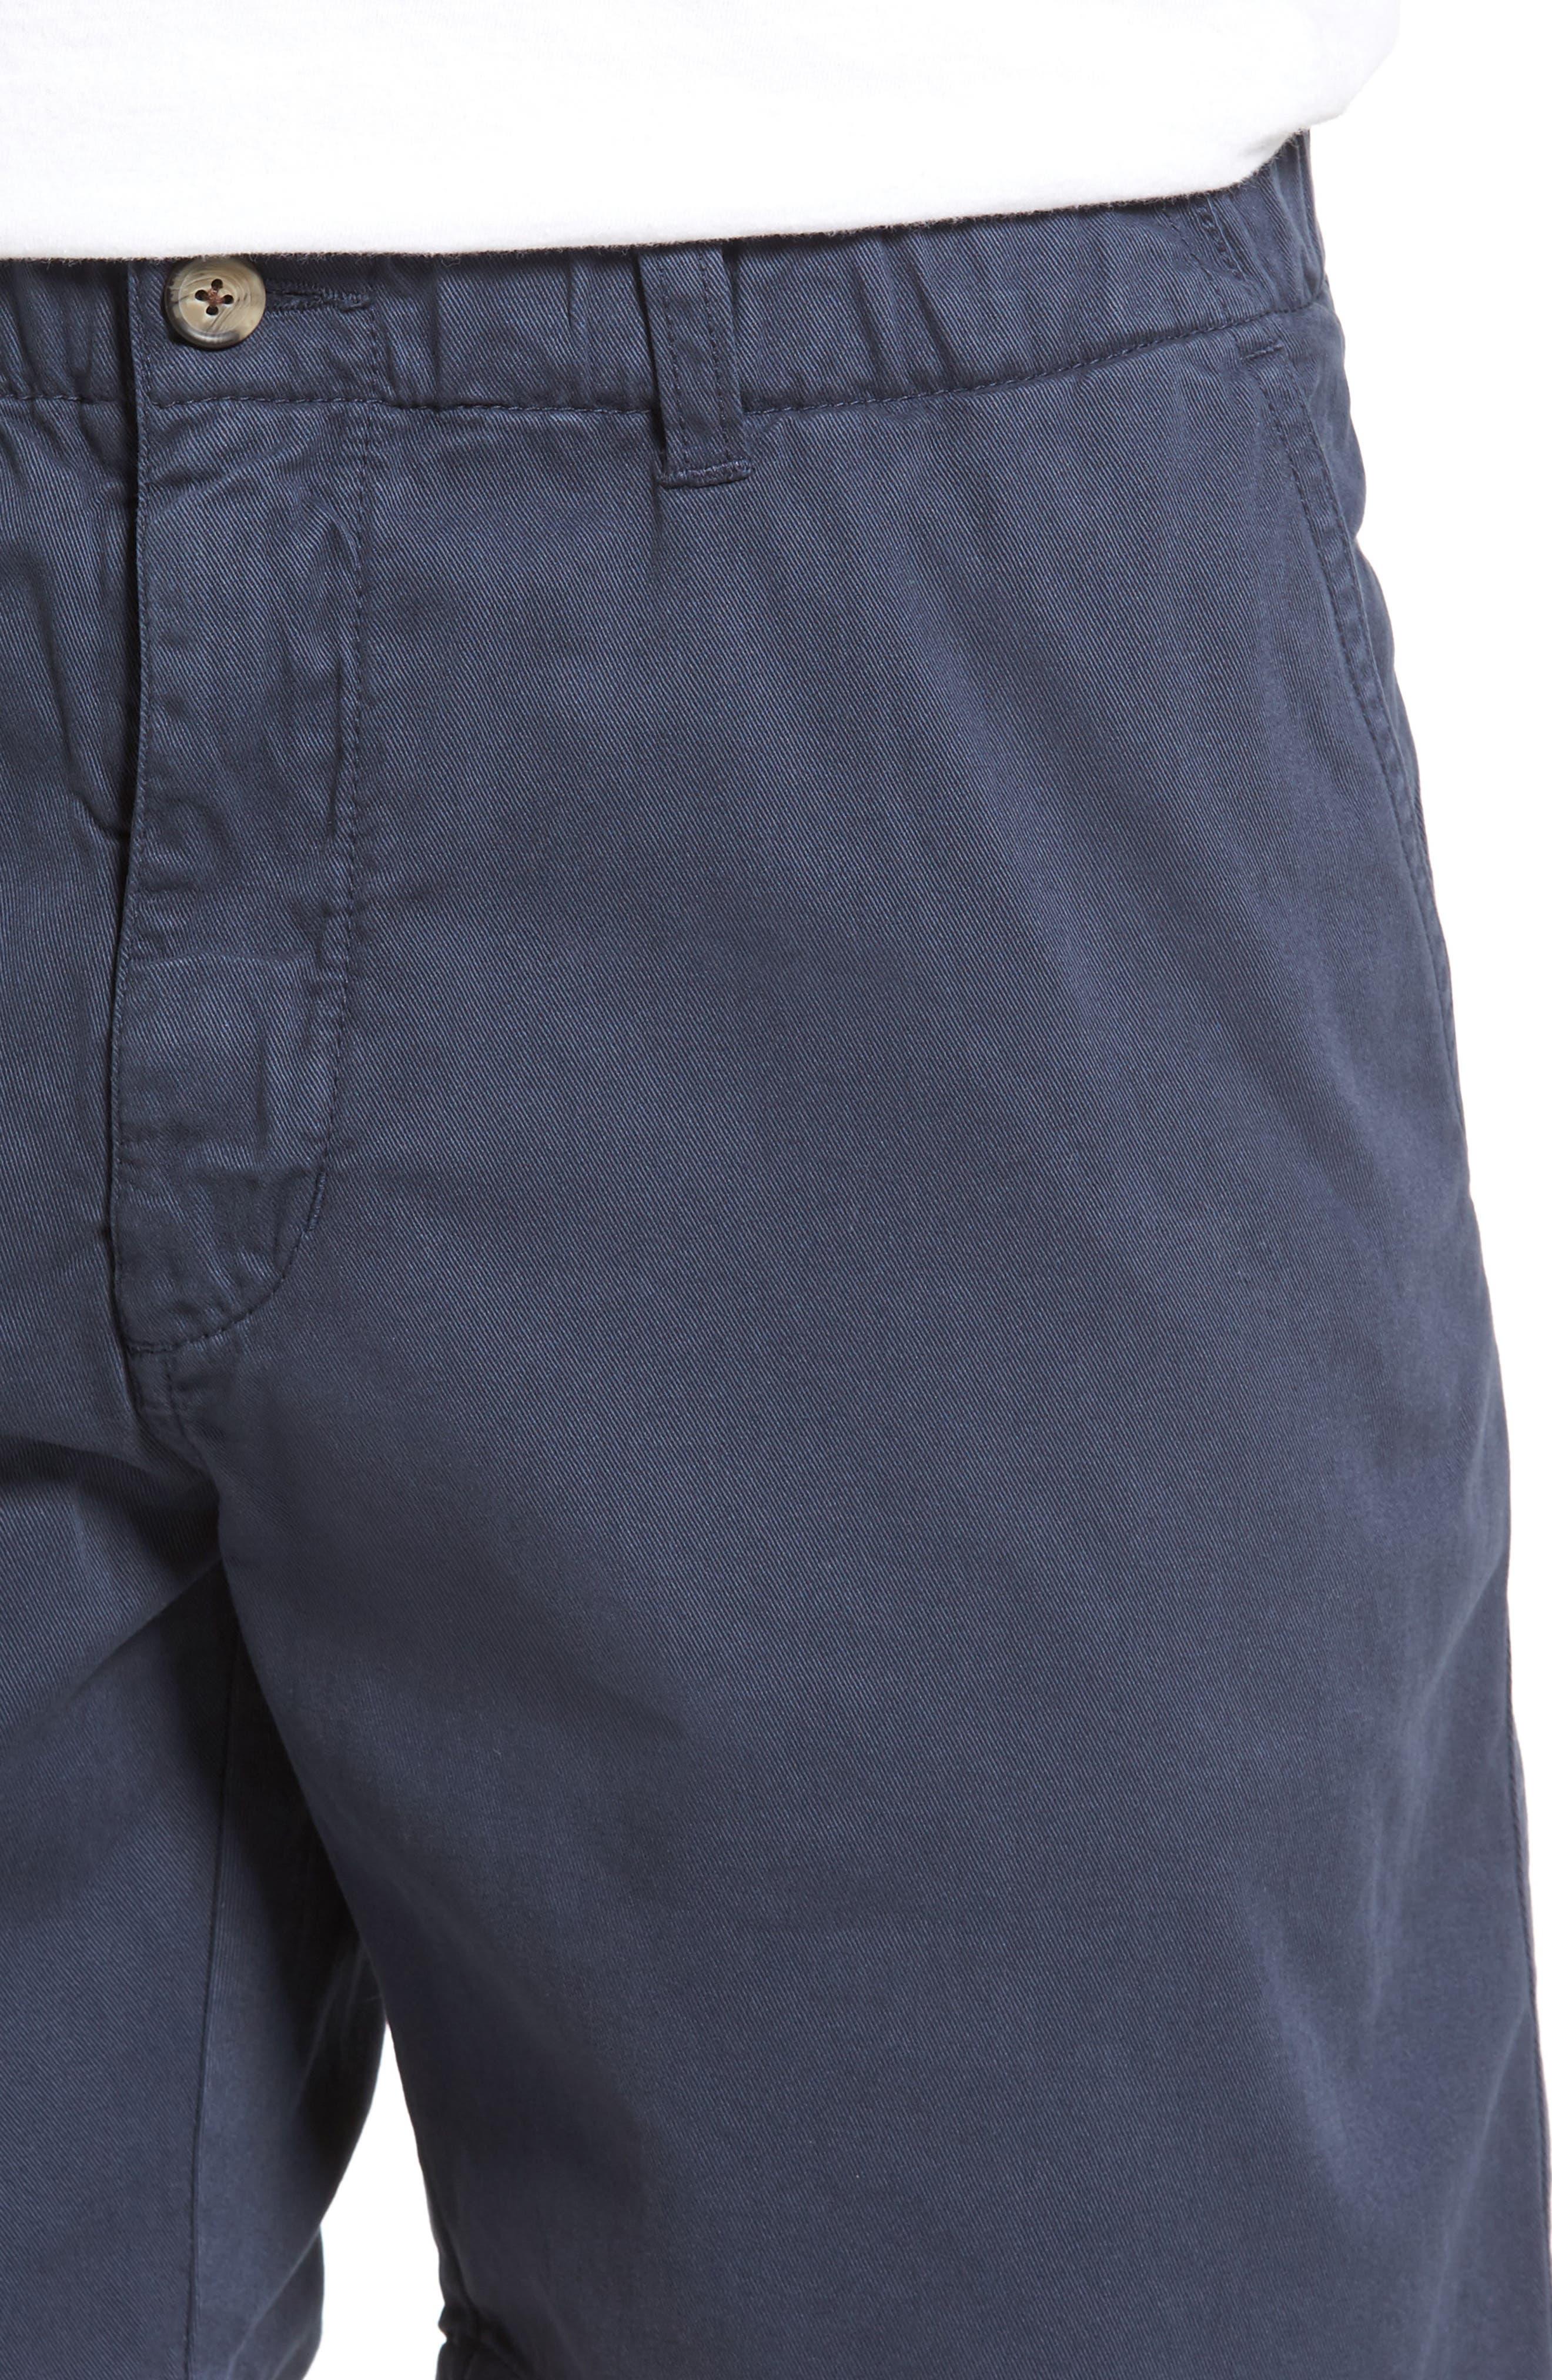 Washed Shorts,                             Alternate thumbnail 21, color,